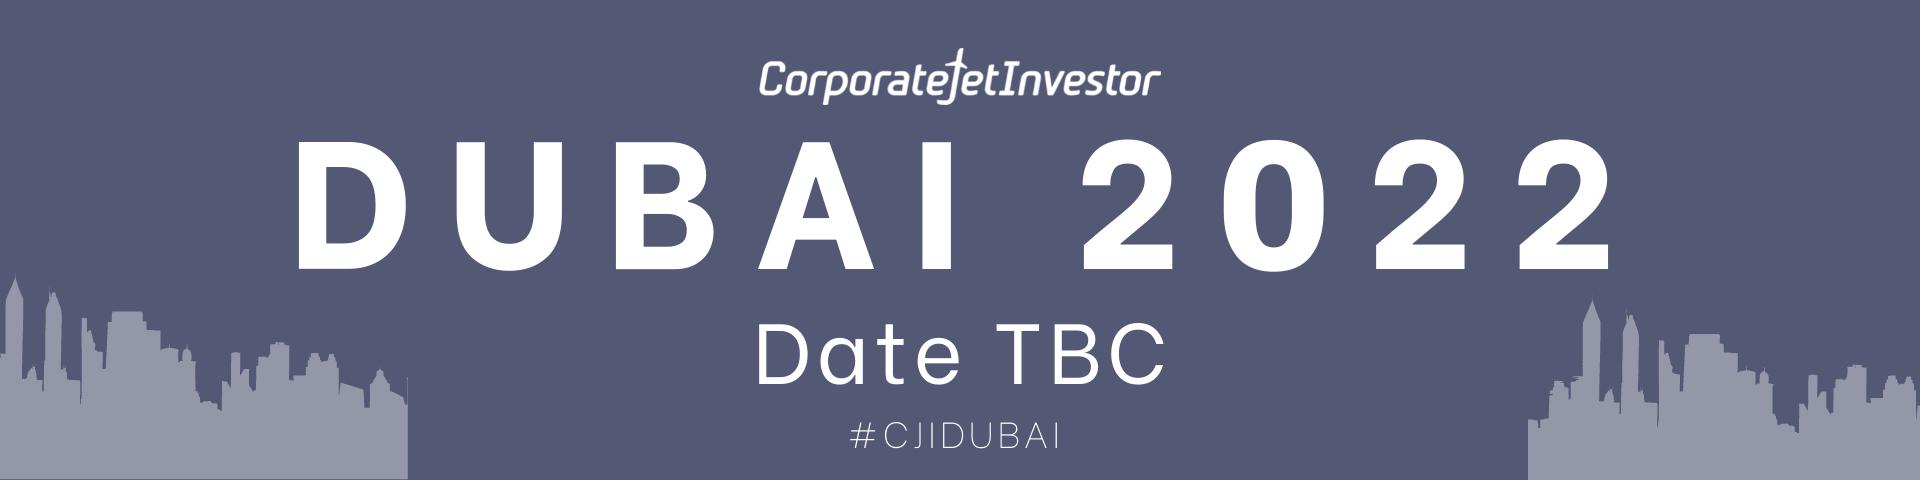 Corporate Jet Investor Dubai 2022